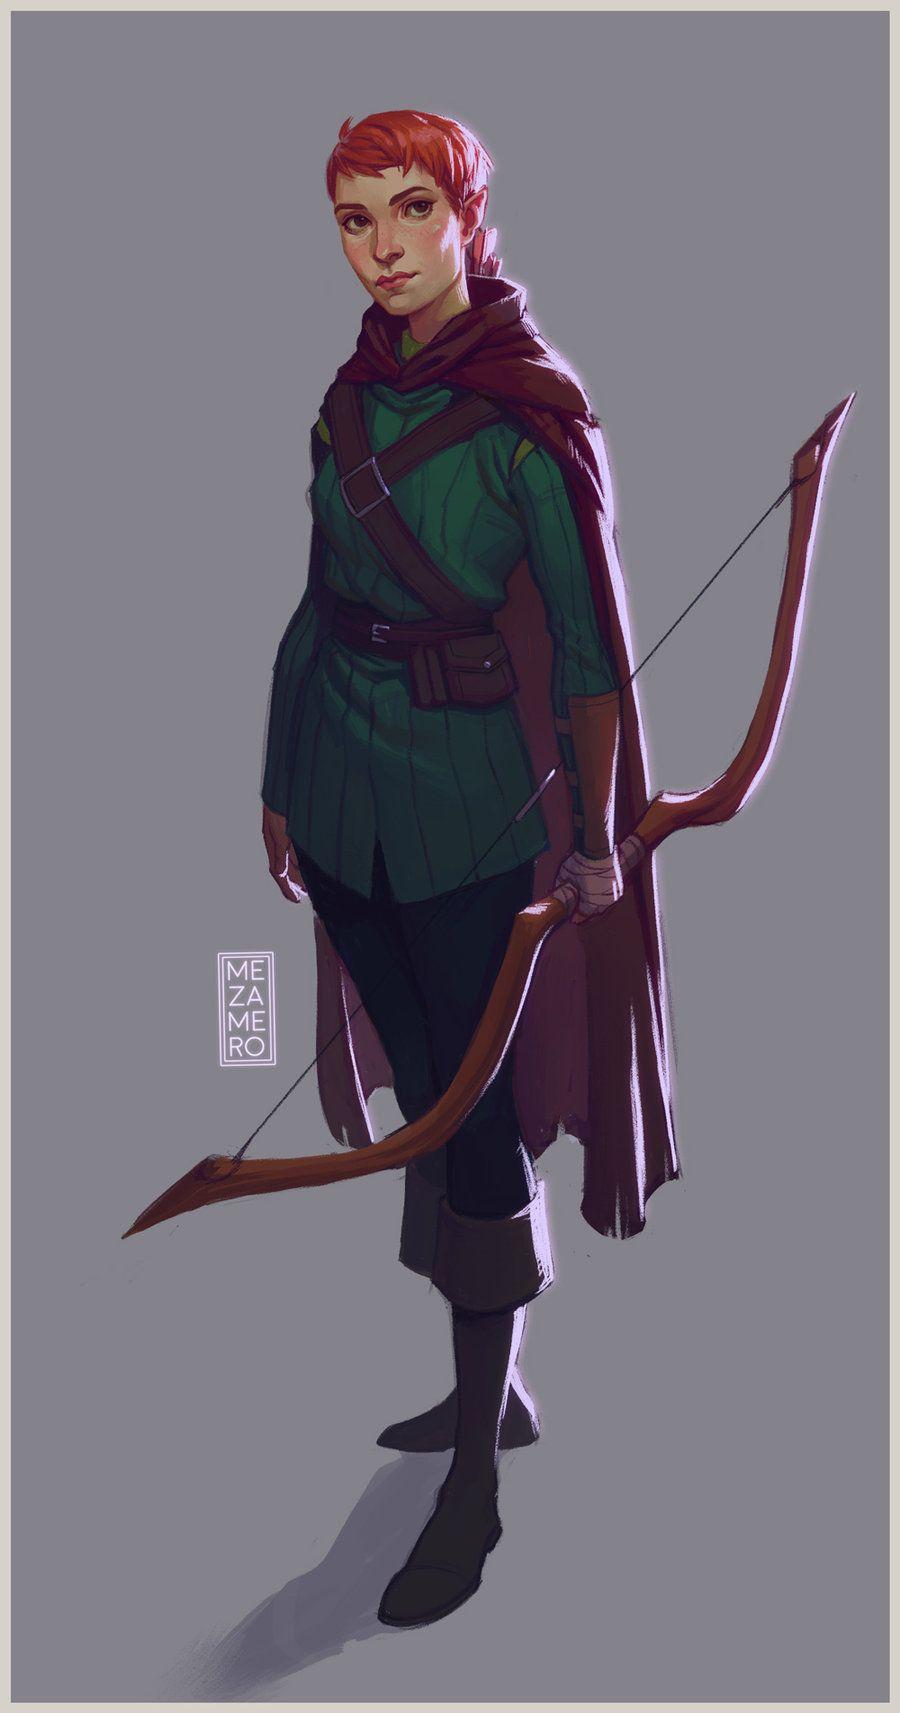 Asha 2 by Mezamero female elf ranger archer bow redhead ...